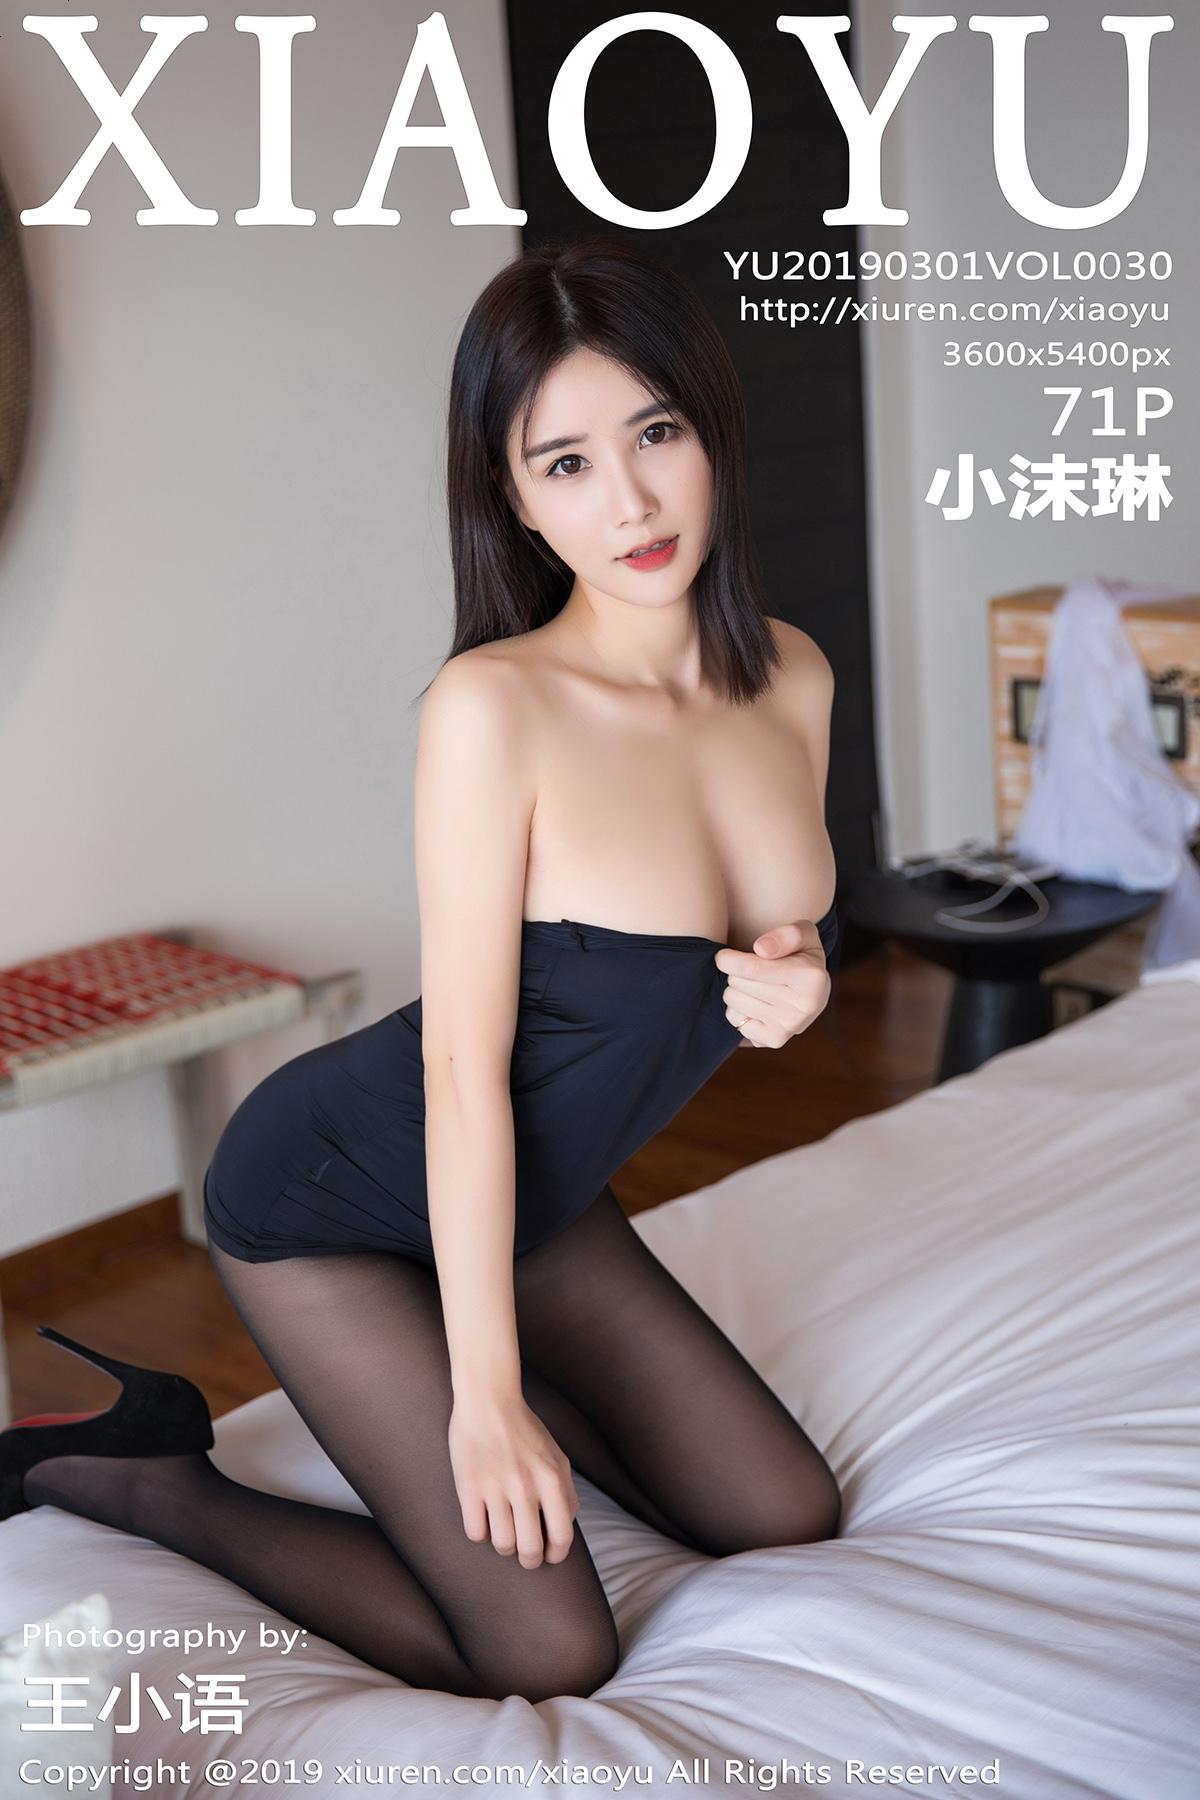 [XIAOYU语画界]2019.03.01 VOL.030 小沫琳 黑丝 美胸[/278MB]